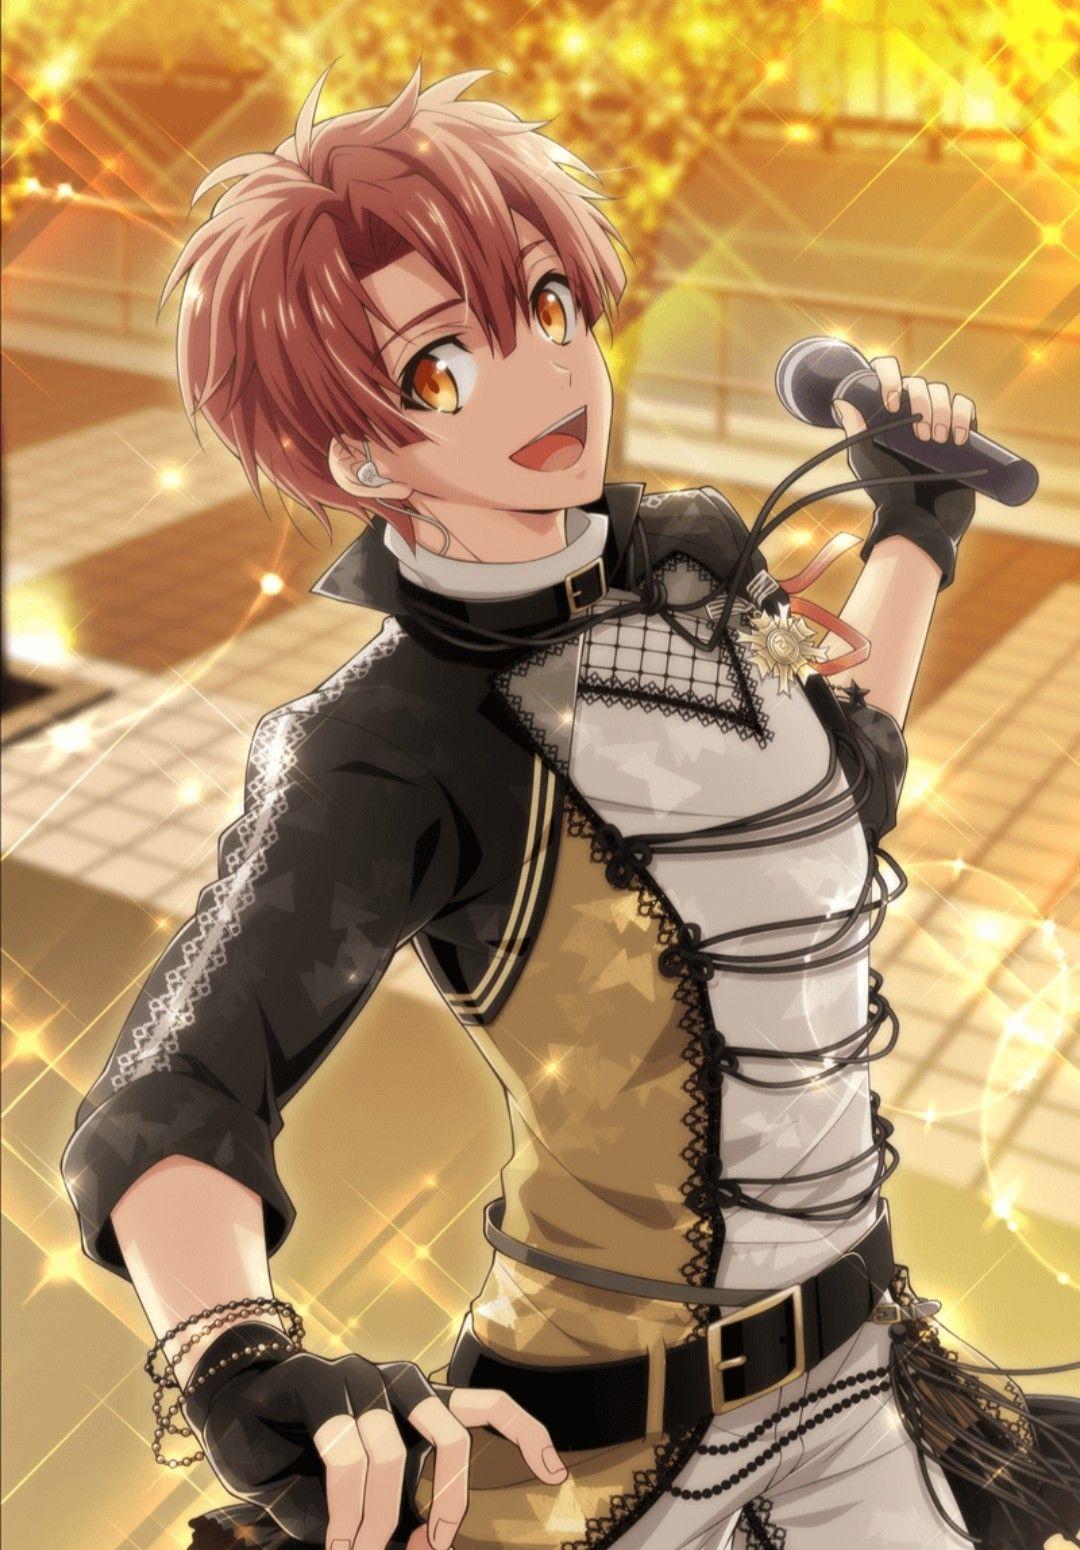 Idolish7 Cards in 2020 Cute anime boy, Anime boy, Anime